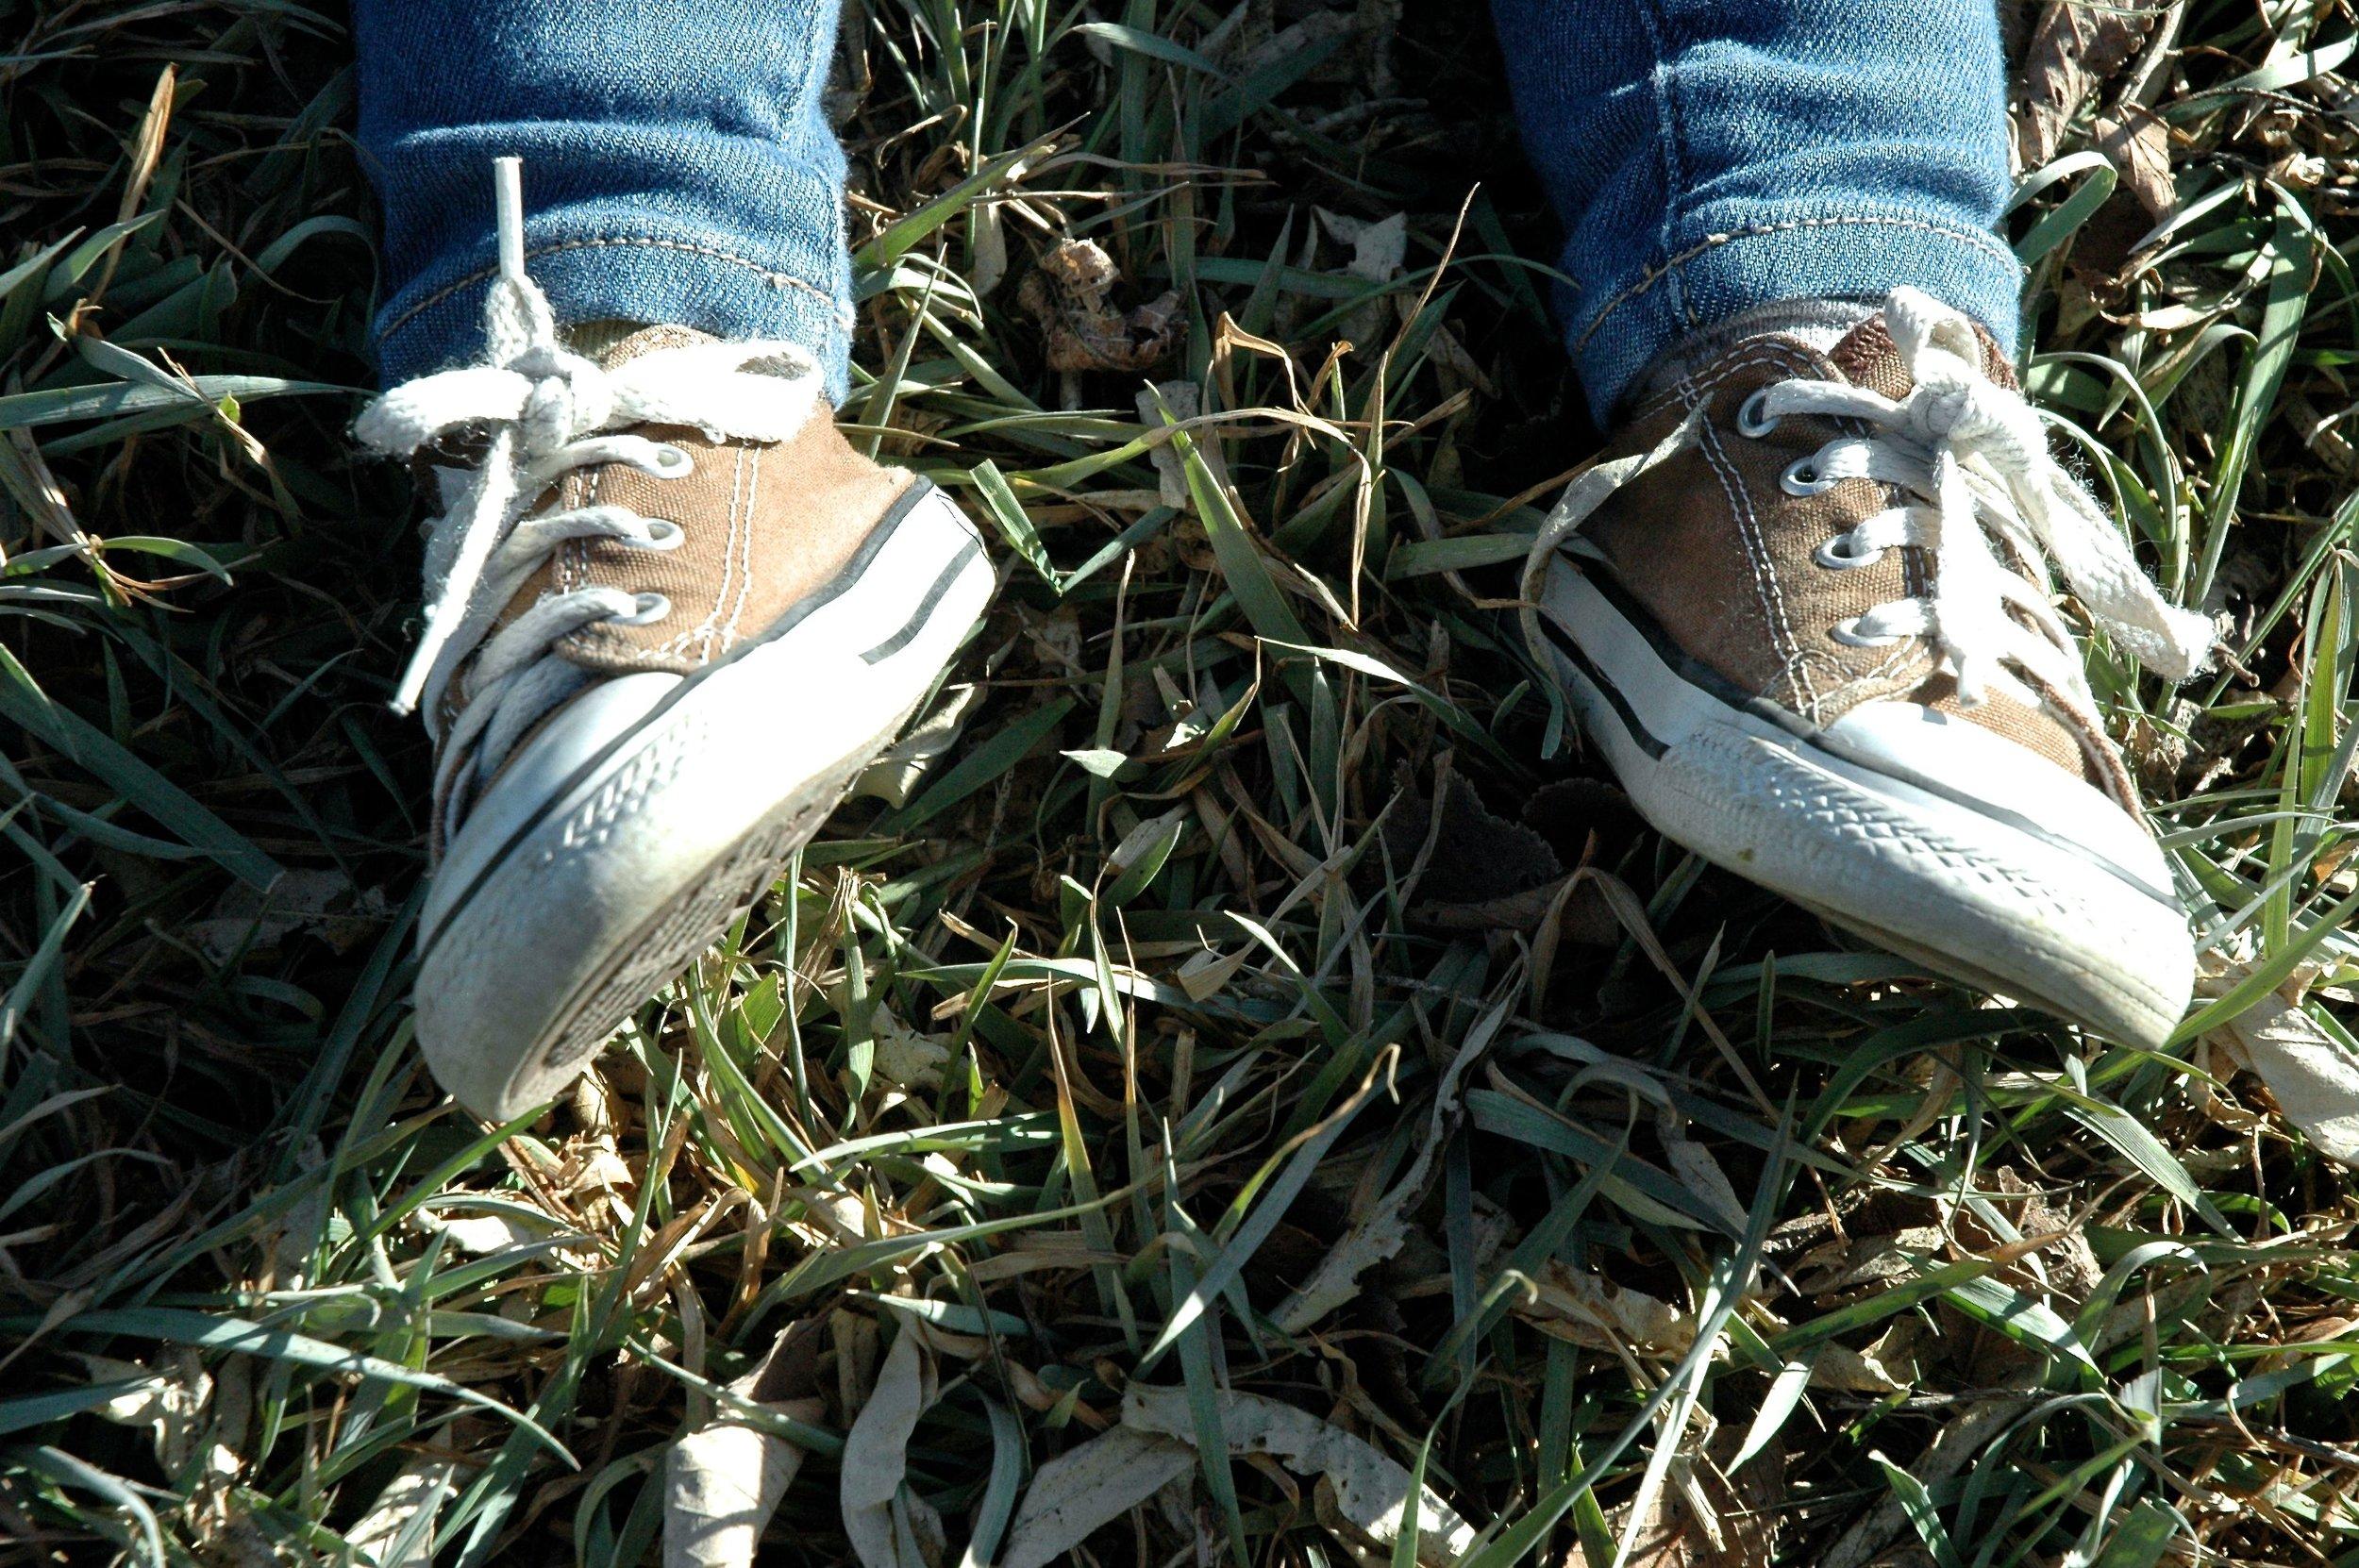 converse-in-grass.jpg